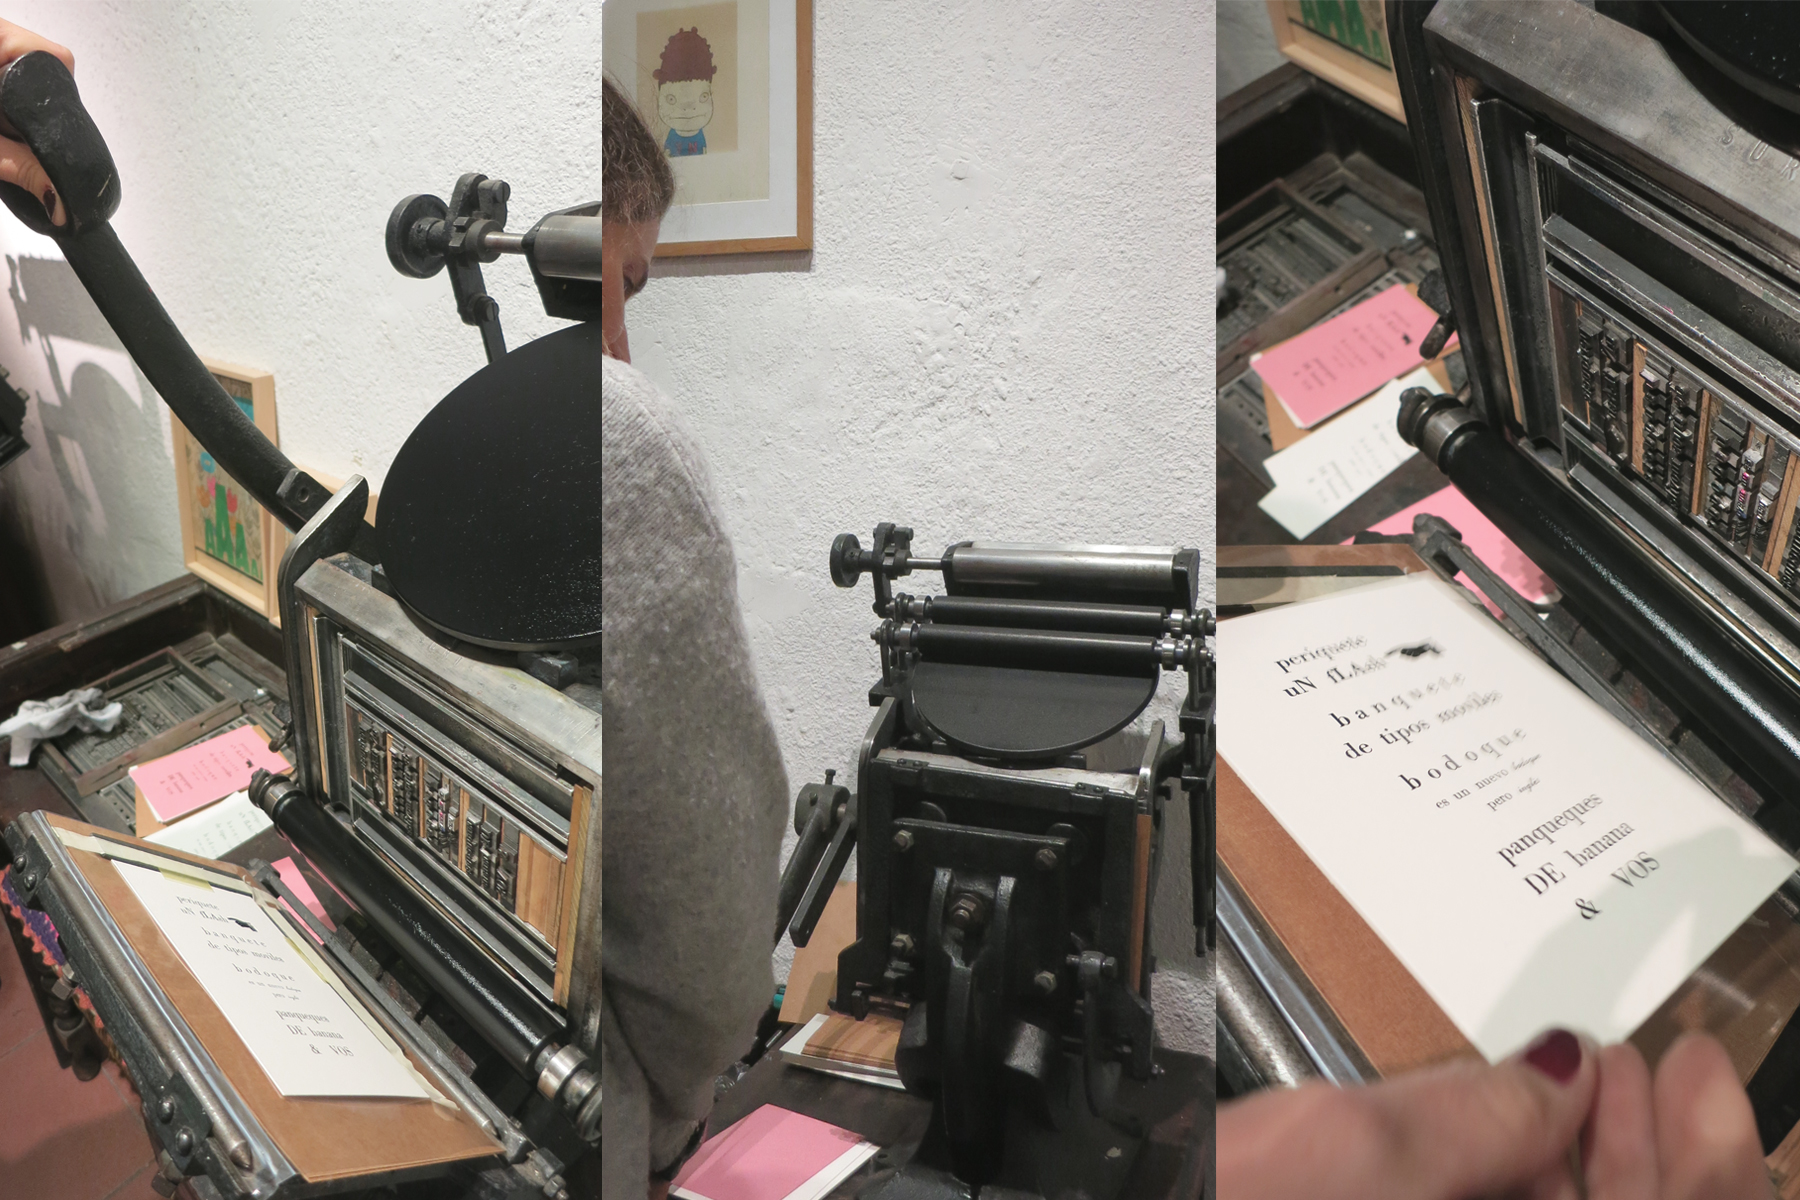 3-taller-letra-por-letra-papel-principal-letterpress-imprenta-tipografica-1.jpg